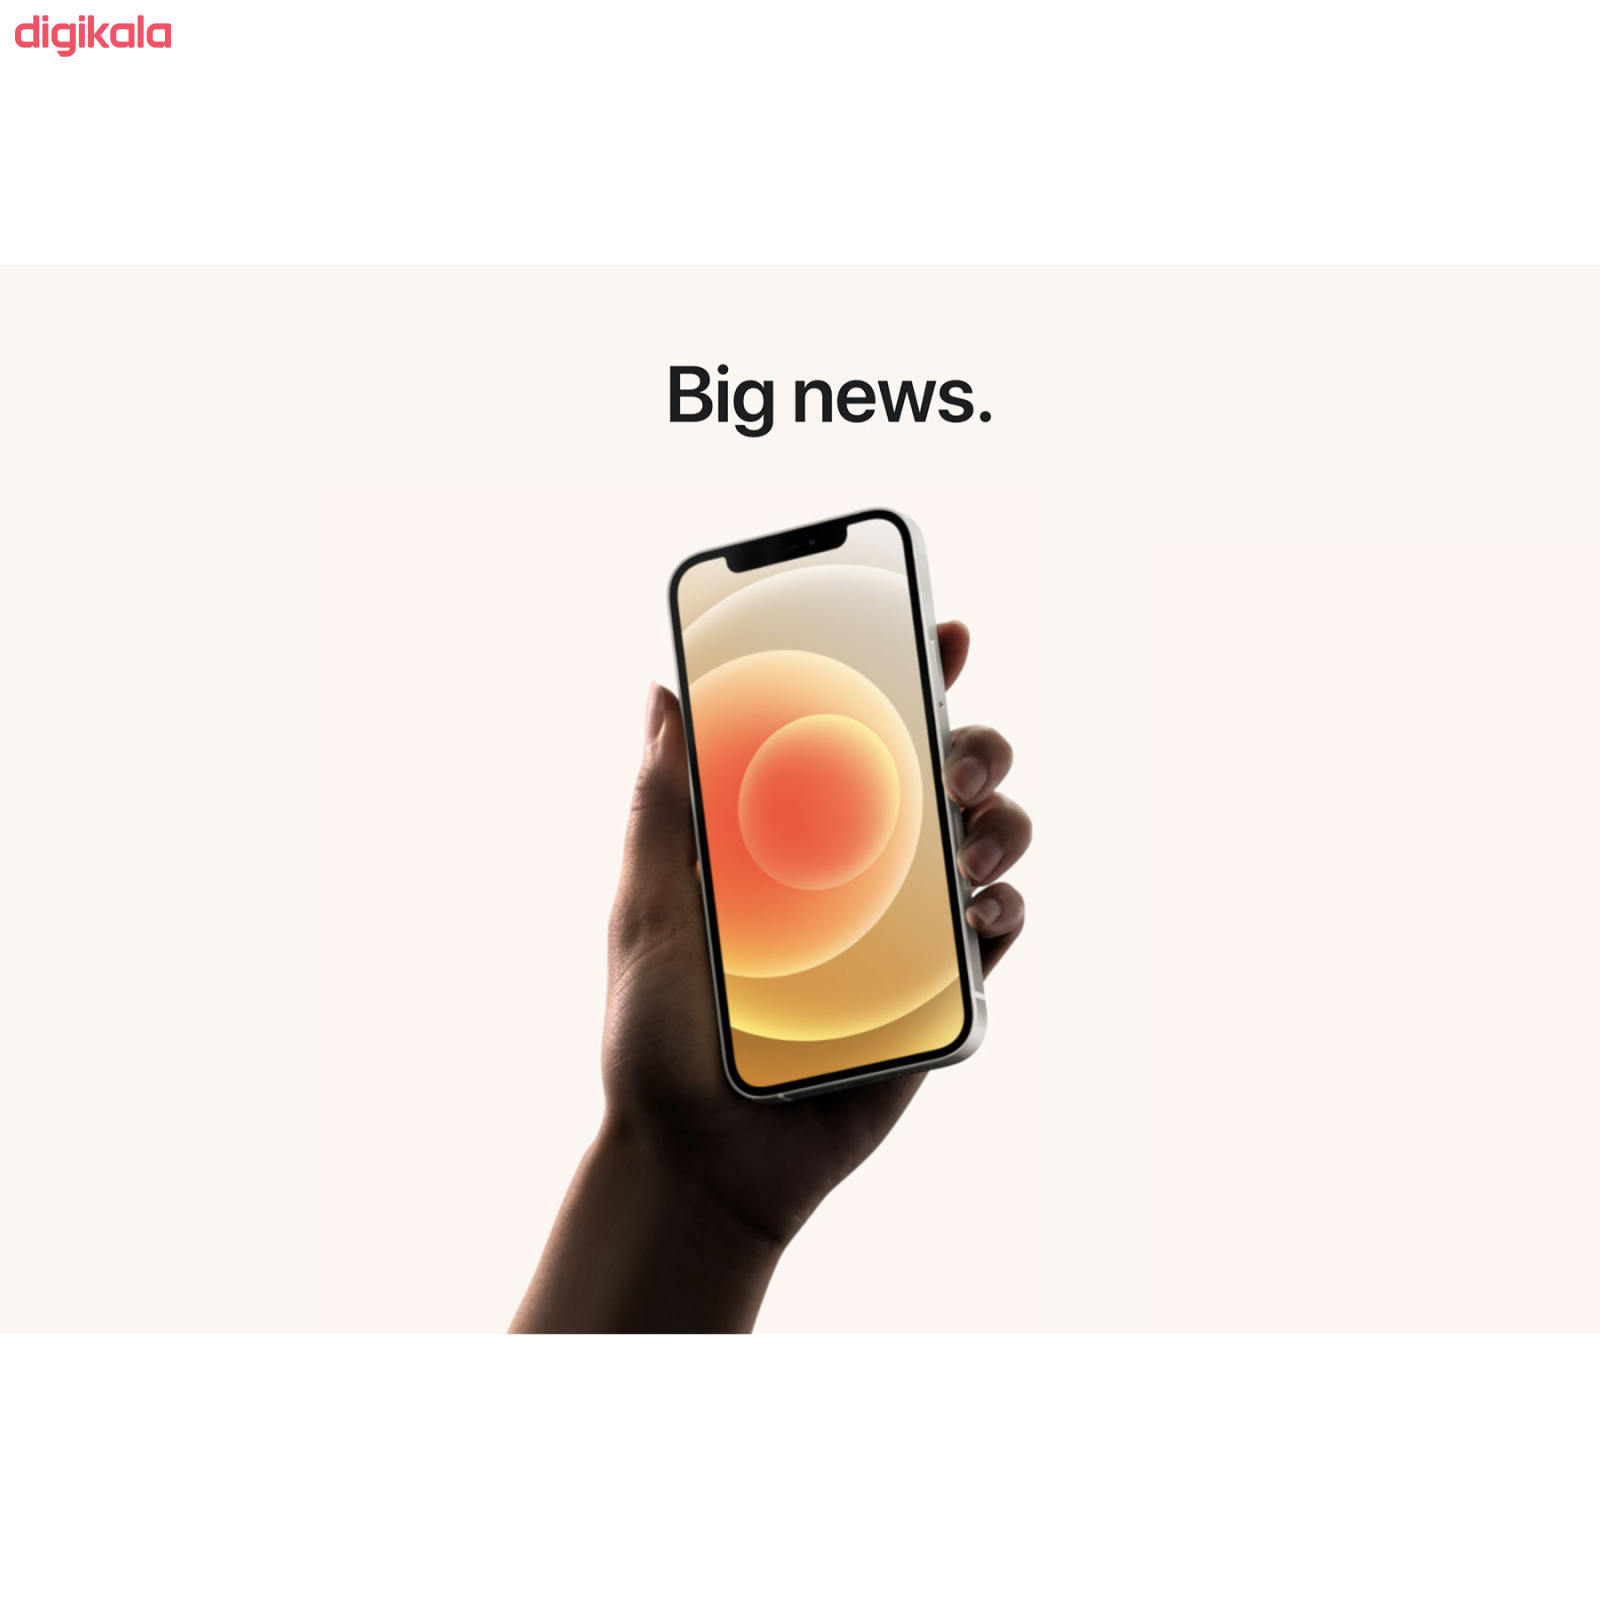 گوشی موبایل اپل مدل iPhone 12 A2404 دو سیم کارت ظرفیت 128 گیگابایت  main 1 15